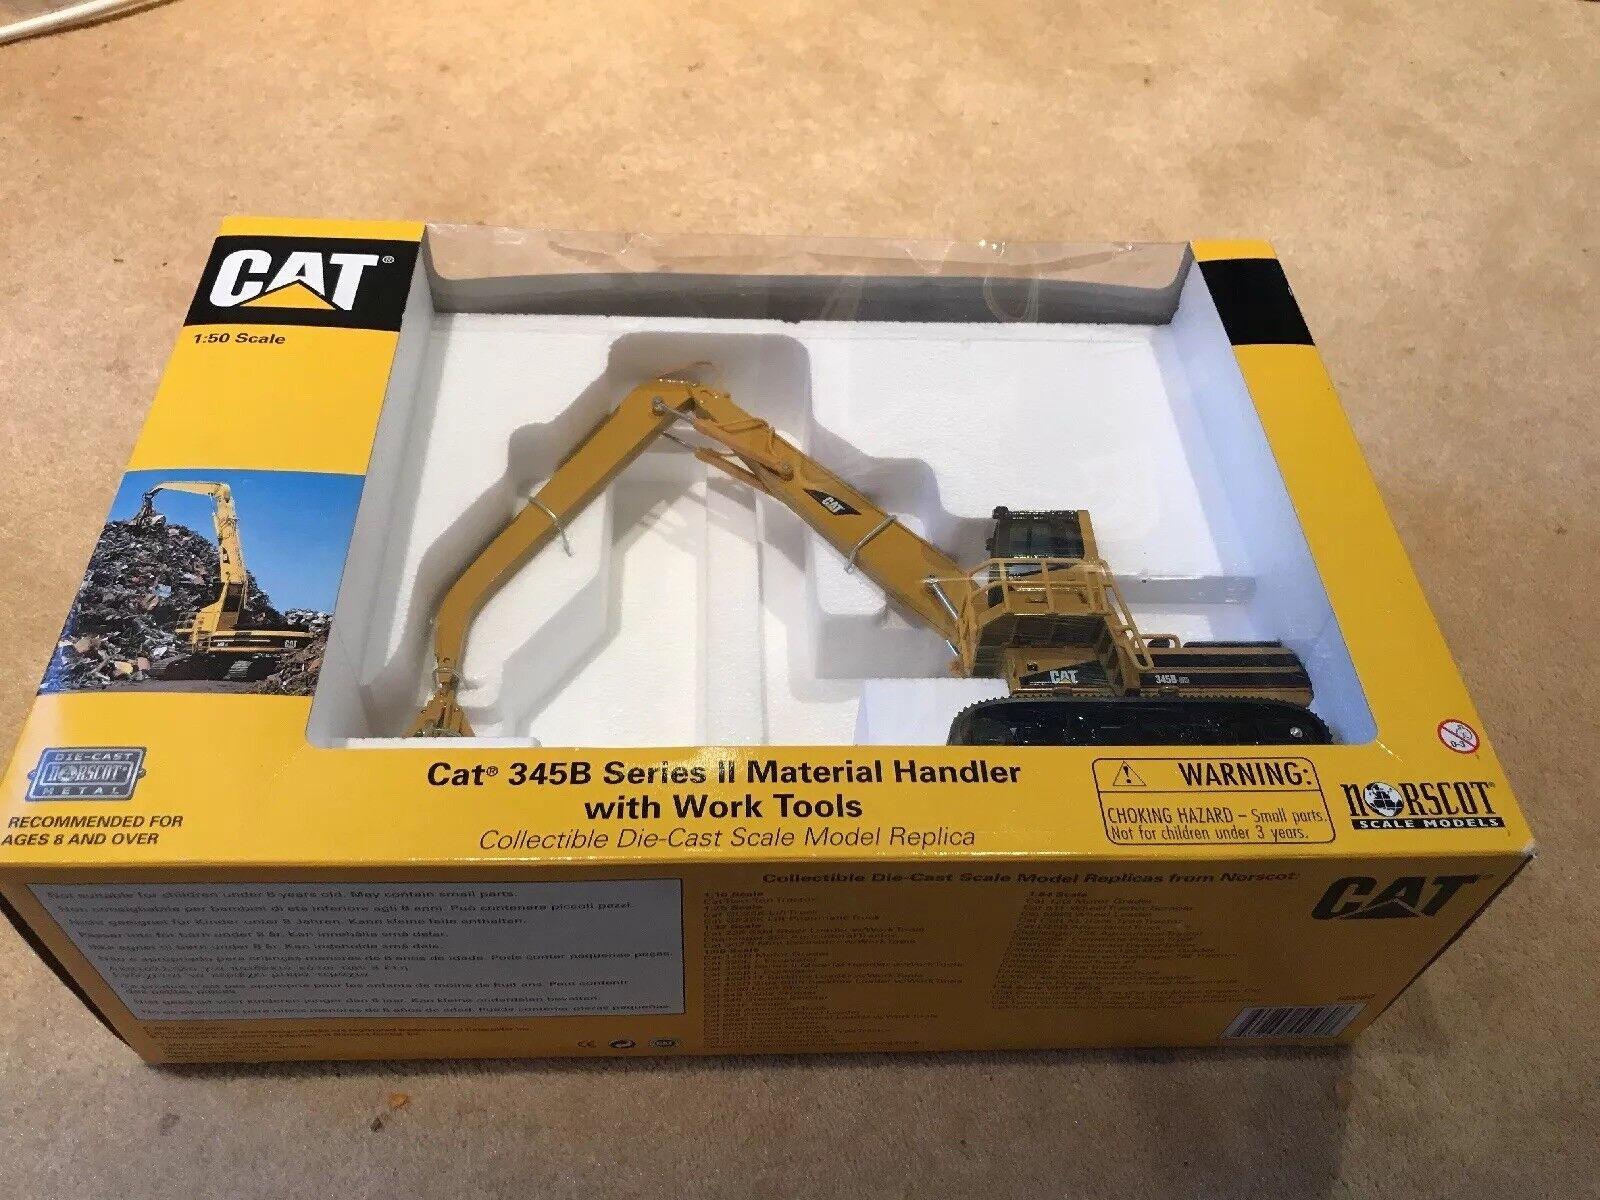 Cat 345b Series II Material Handler With Work Tools